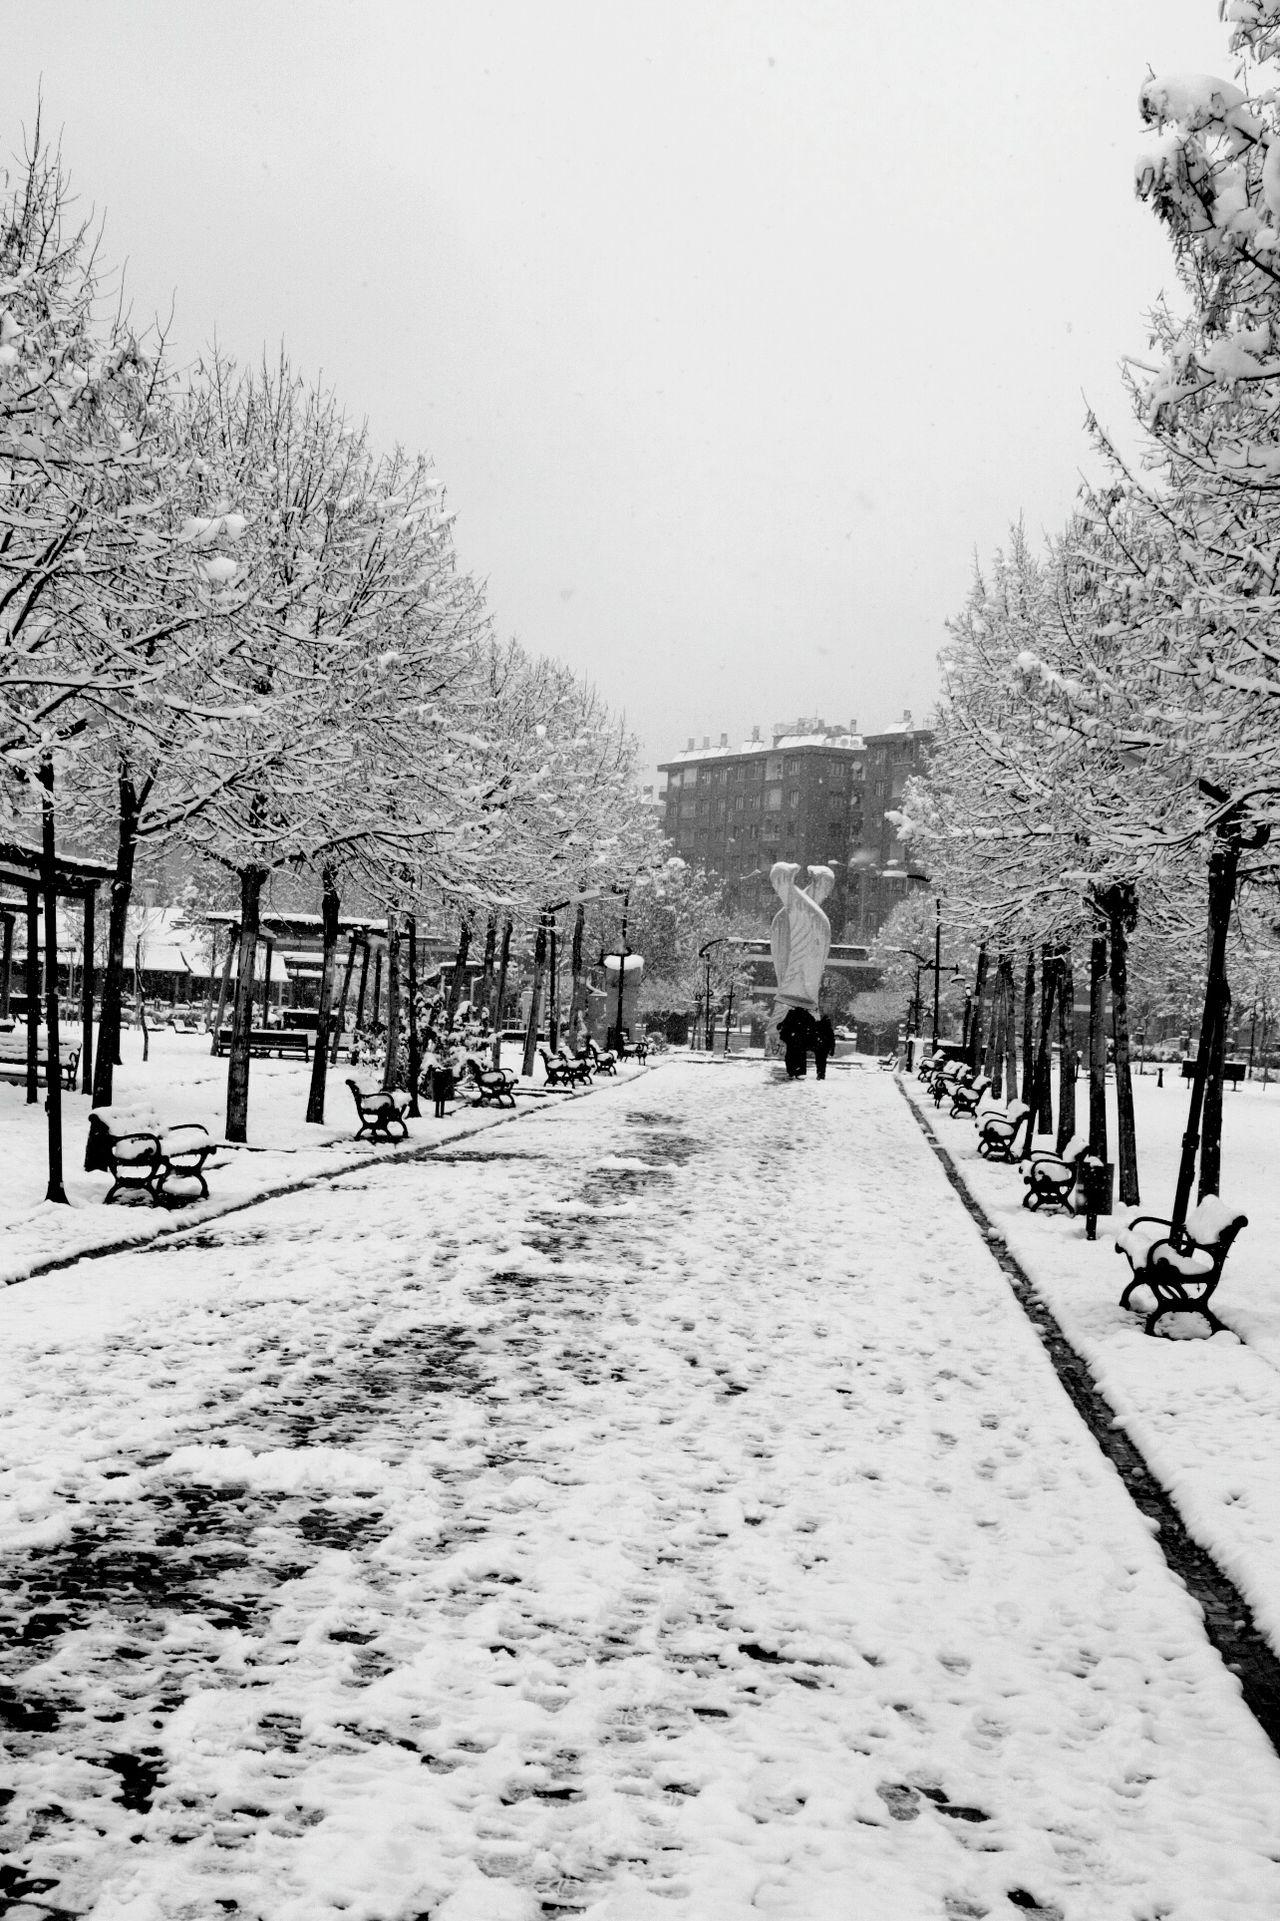 EyeEm Best Shots Snow Day Taking Photos Eyemphotography Black And White GoodEvening !❤ Snow ❄ EyeEm Eyemstreetphoto